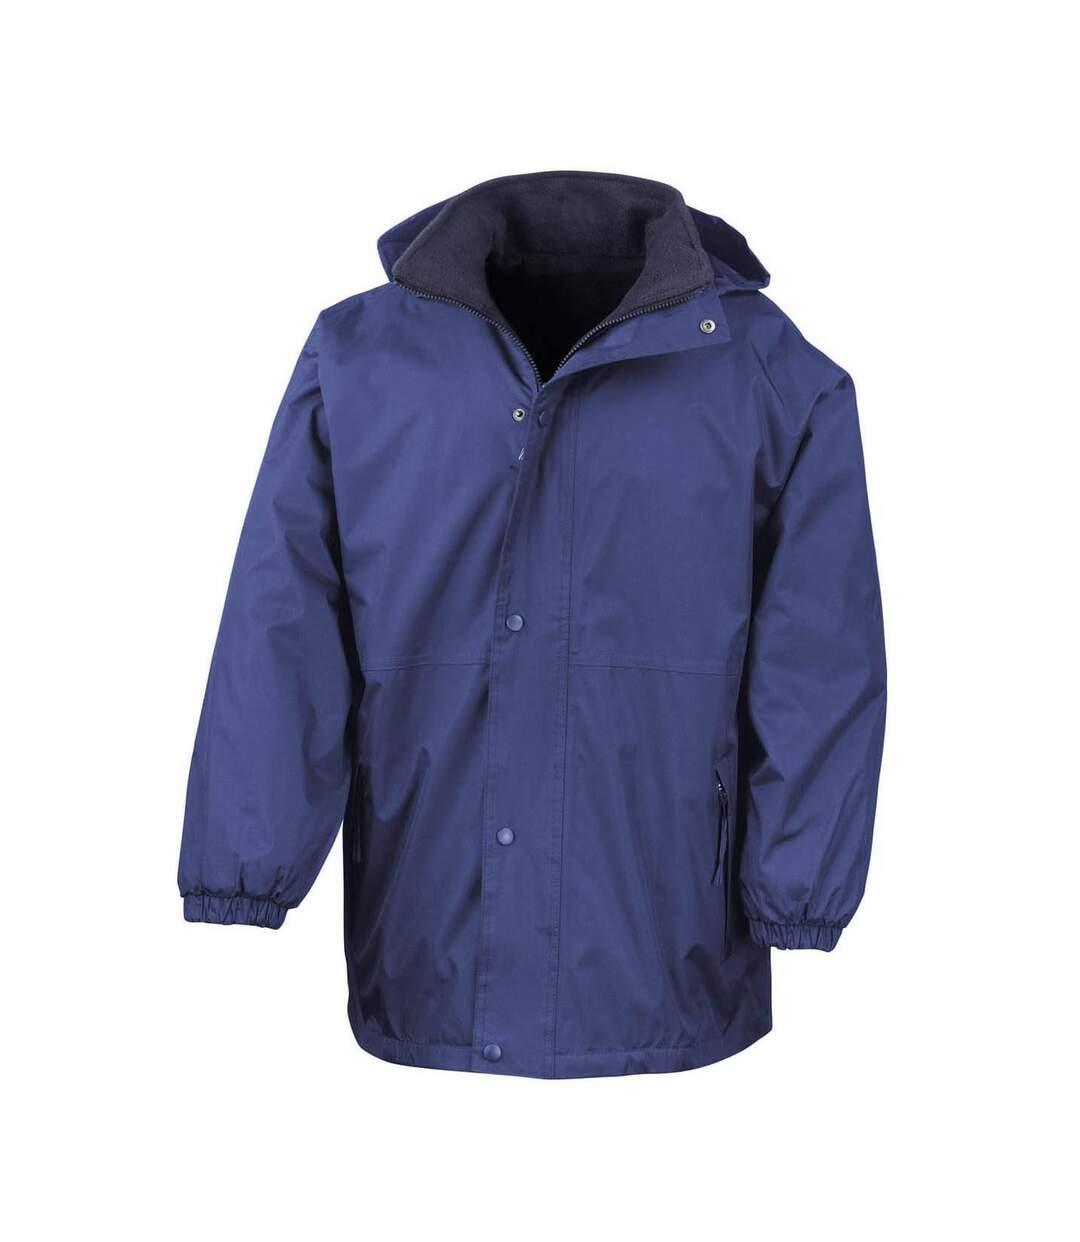 Result Mens Reversible StormDri 4,000 Waterproof Windproof Anti Pilling Fleece Jacket (Royal/Navy) - UTBC884